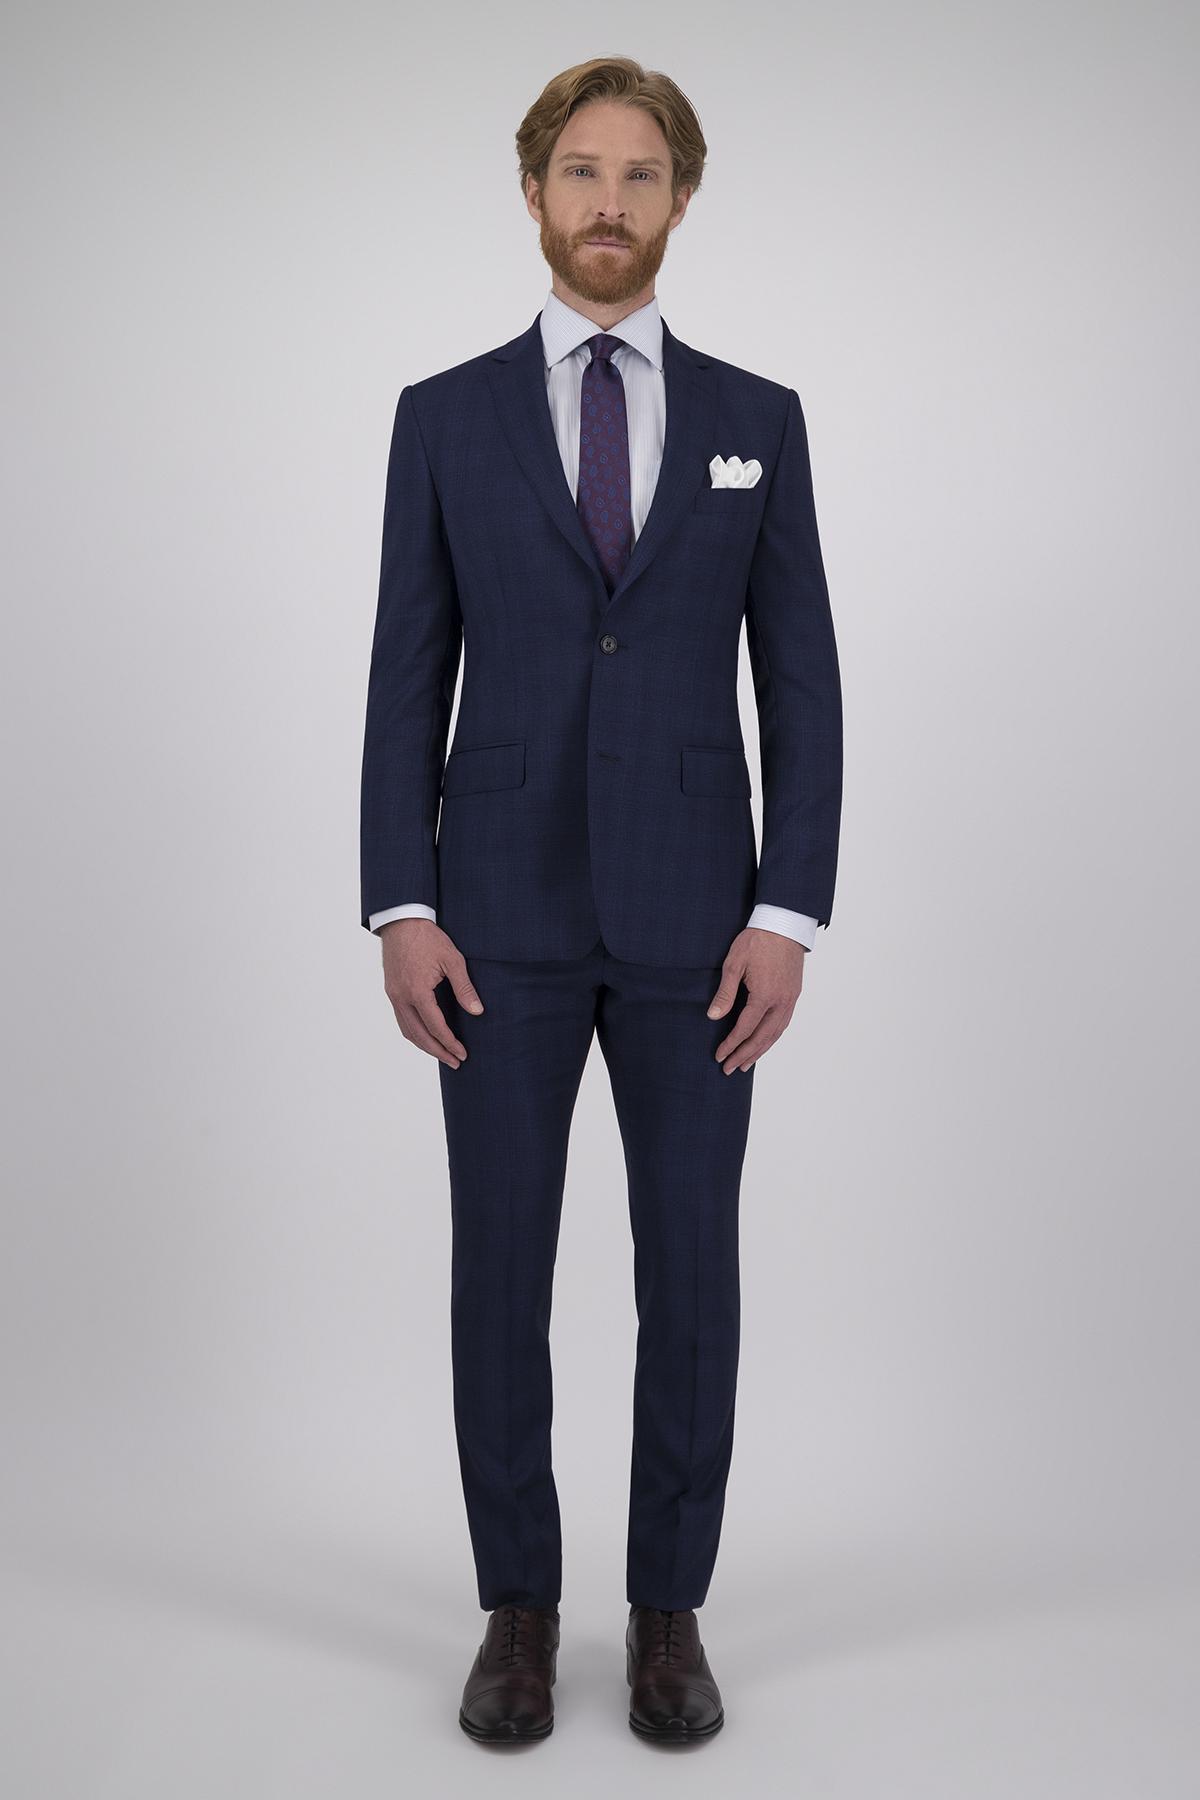 Traje Calderoni Couture Azul a Cuadros con Tejido super 150´s Lana 100% Corte Regular, 2 Piezas